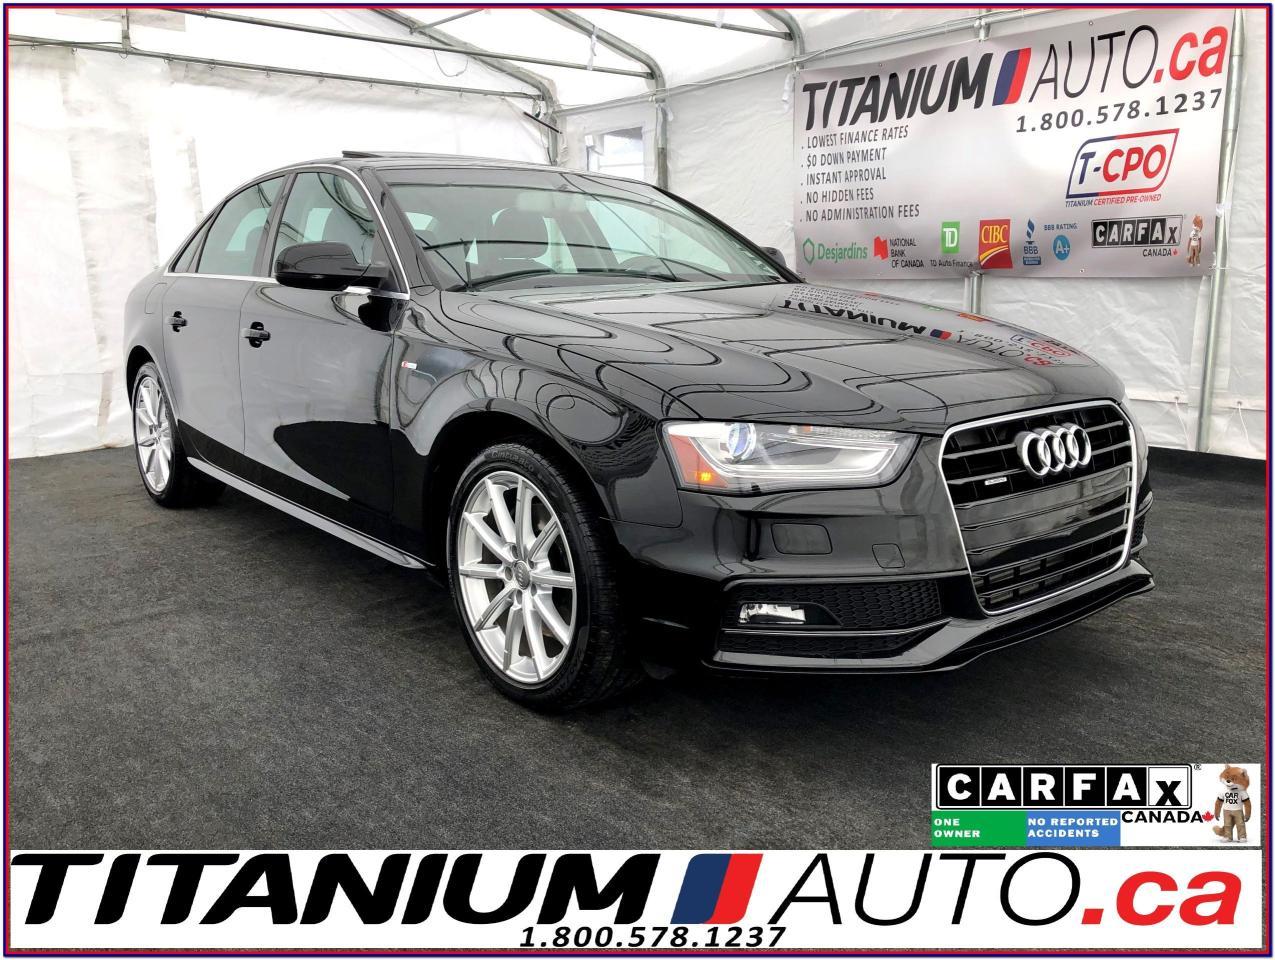 2015 Audi A4 S Line-Progressiv+-Quattro-Camera-GPS-Sunroof-HID-